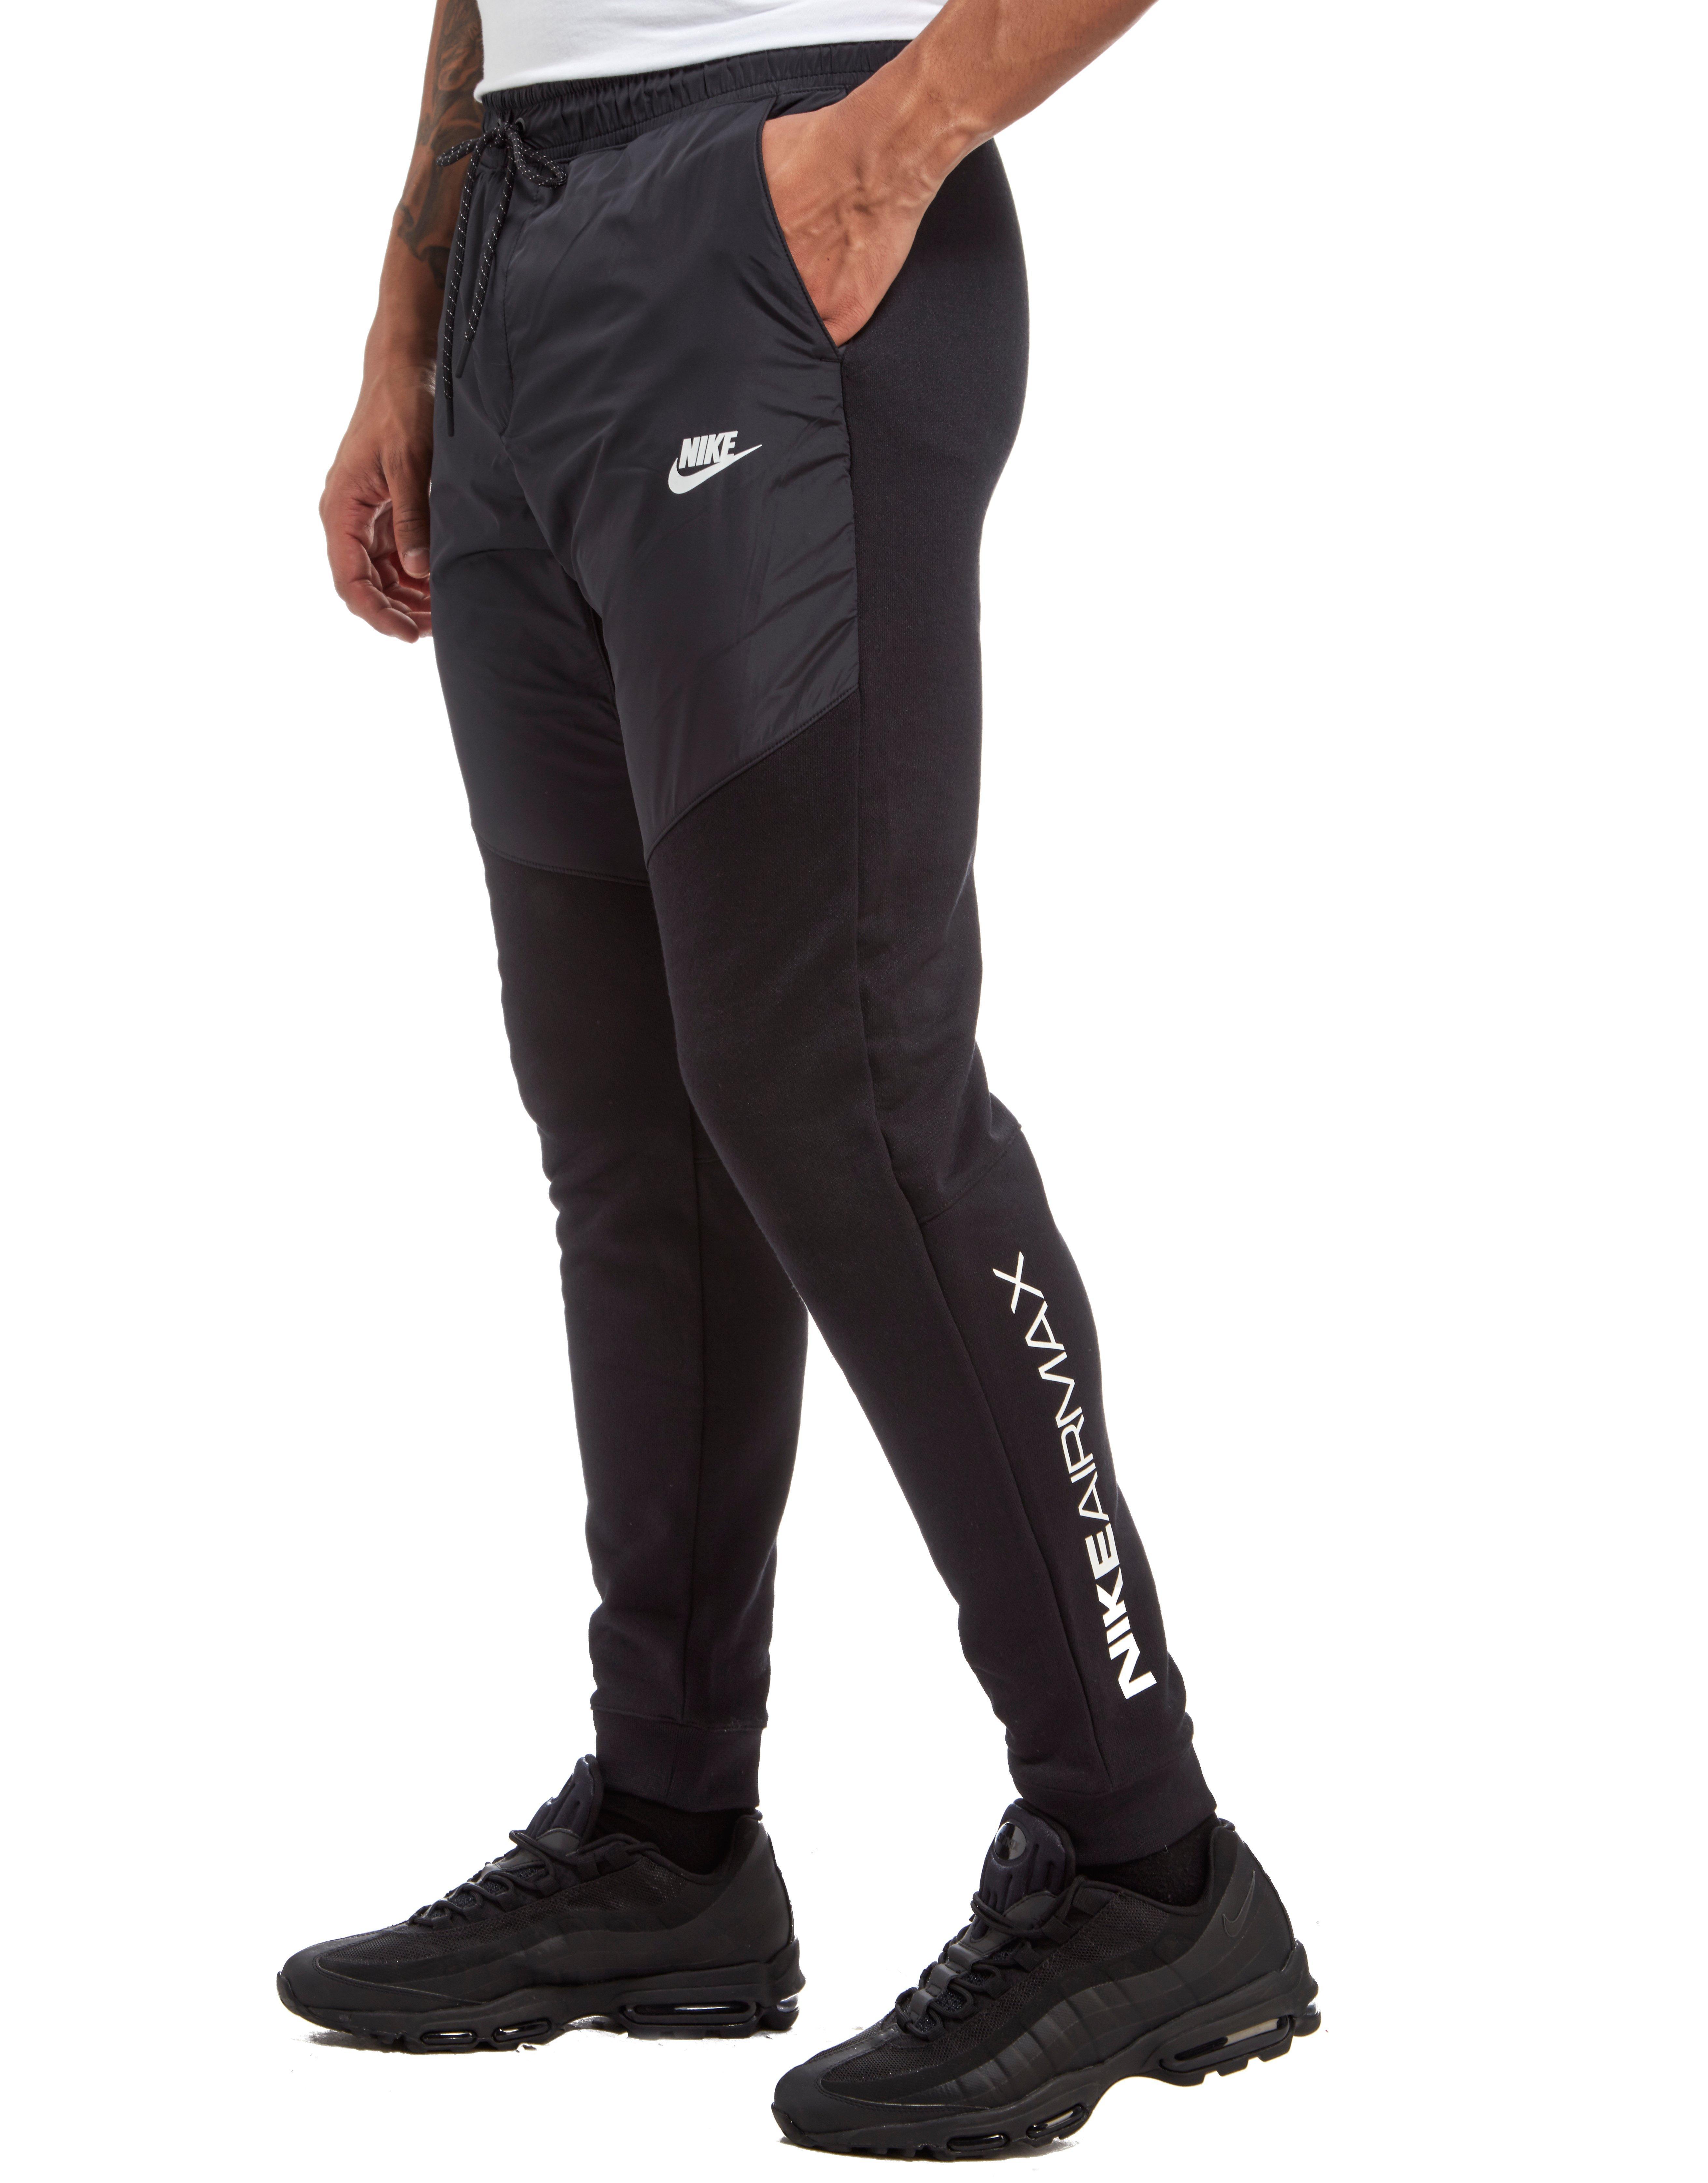 jogging nike air homme,Nike Air Max Homme 2017 nouveau